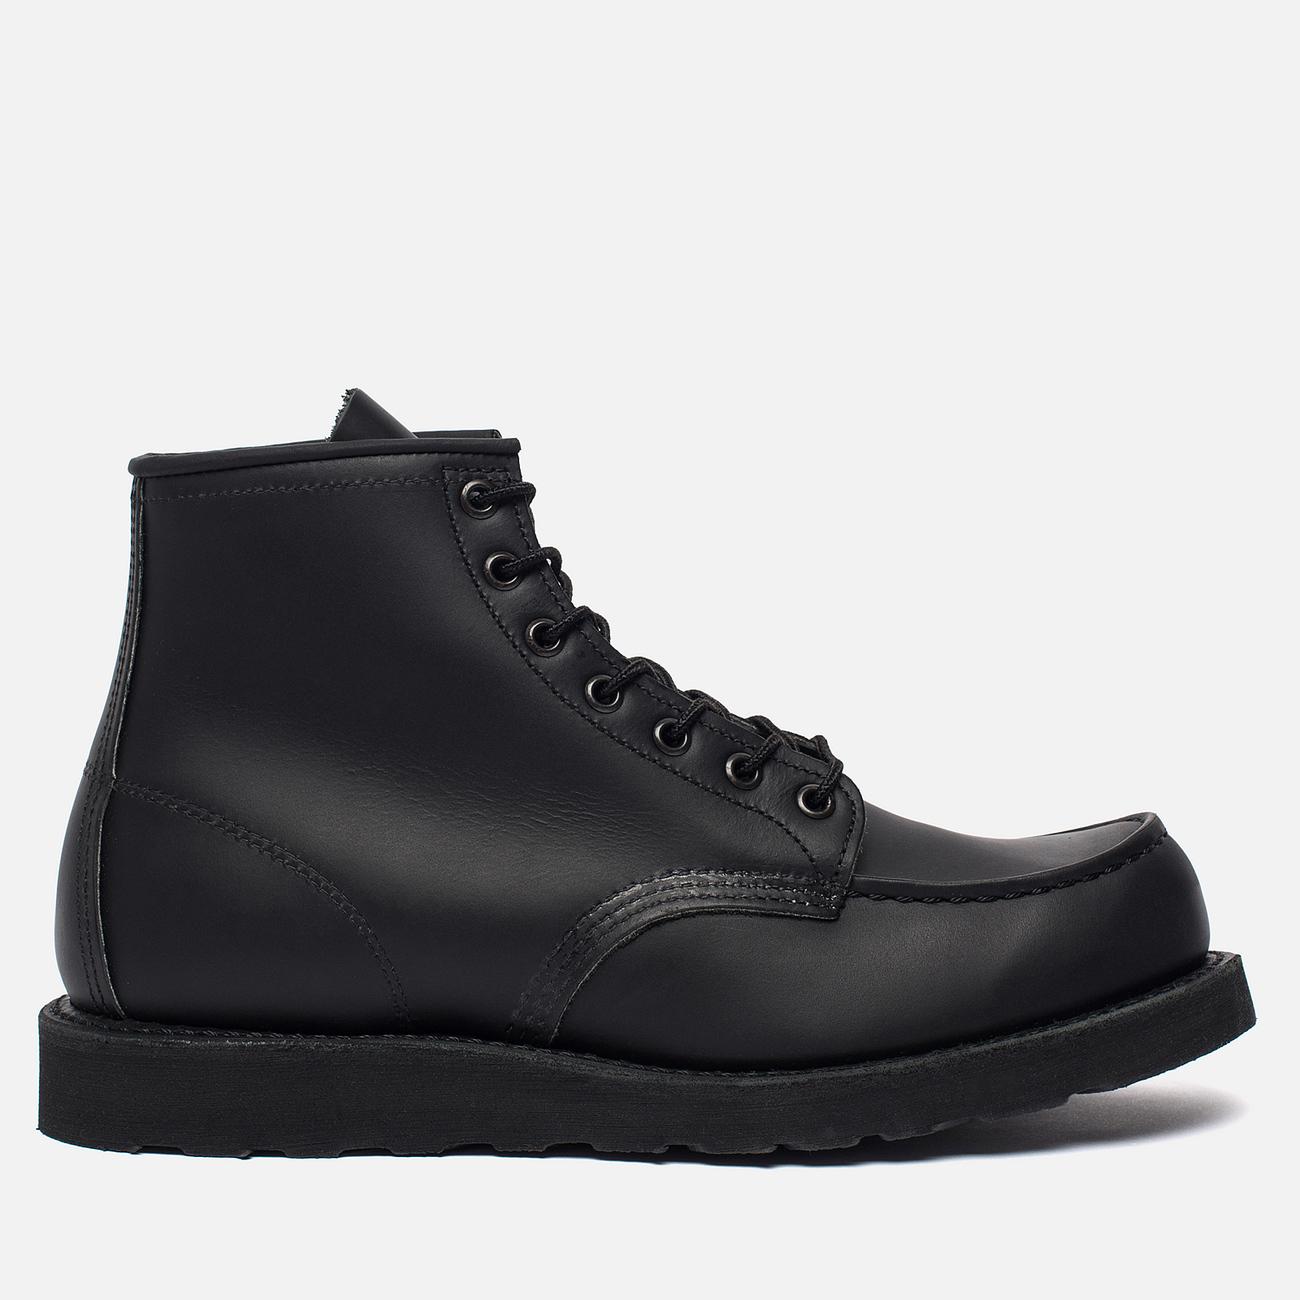 Мужские ботинки Red Wing Shoes 8137 6-Inch Moc Leather Black Skagway